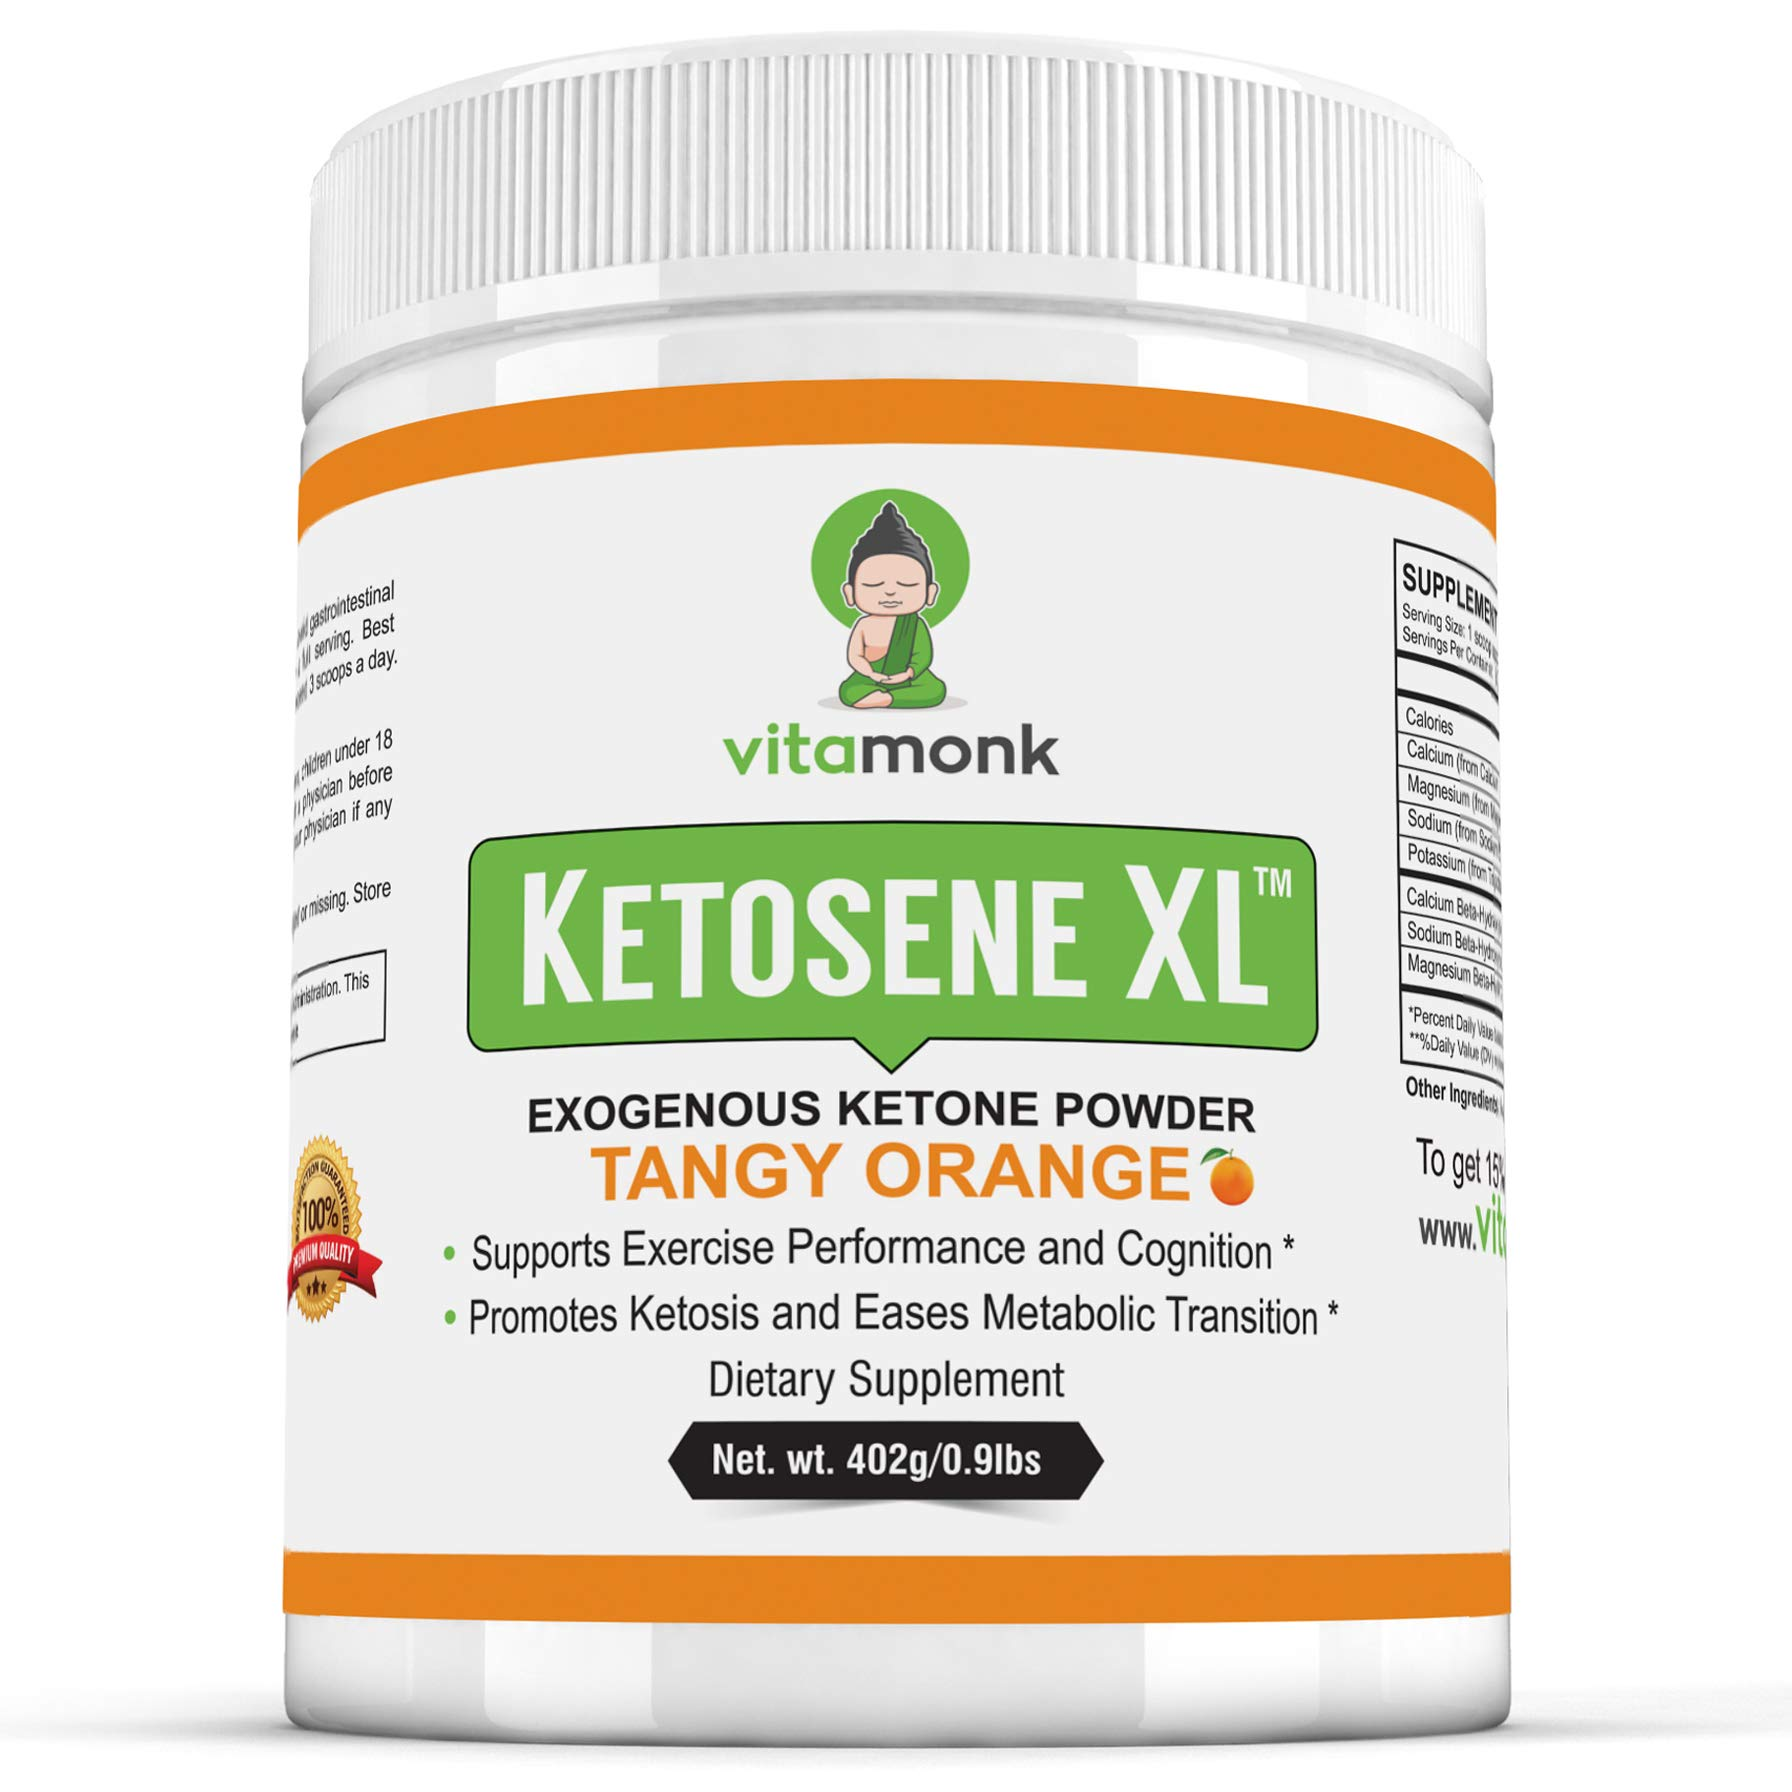 Ketosene XLTM 30 Servings Extra Large Exogenous Ketones Powder - Kickstart Ketosis Within 1-Hour with a Pure Blend of Calcium and Magnesium Ketone BHB Salts (KetoVantage BHB) - for Keto Diet Bulk by VitaMonk